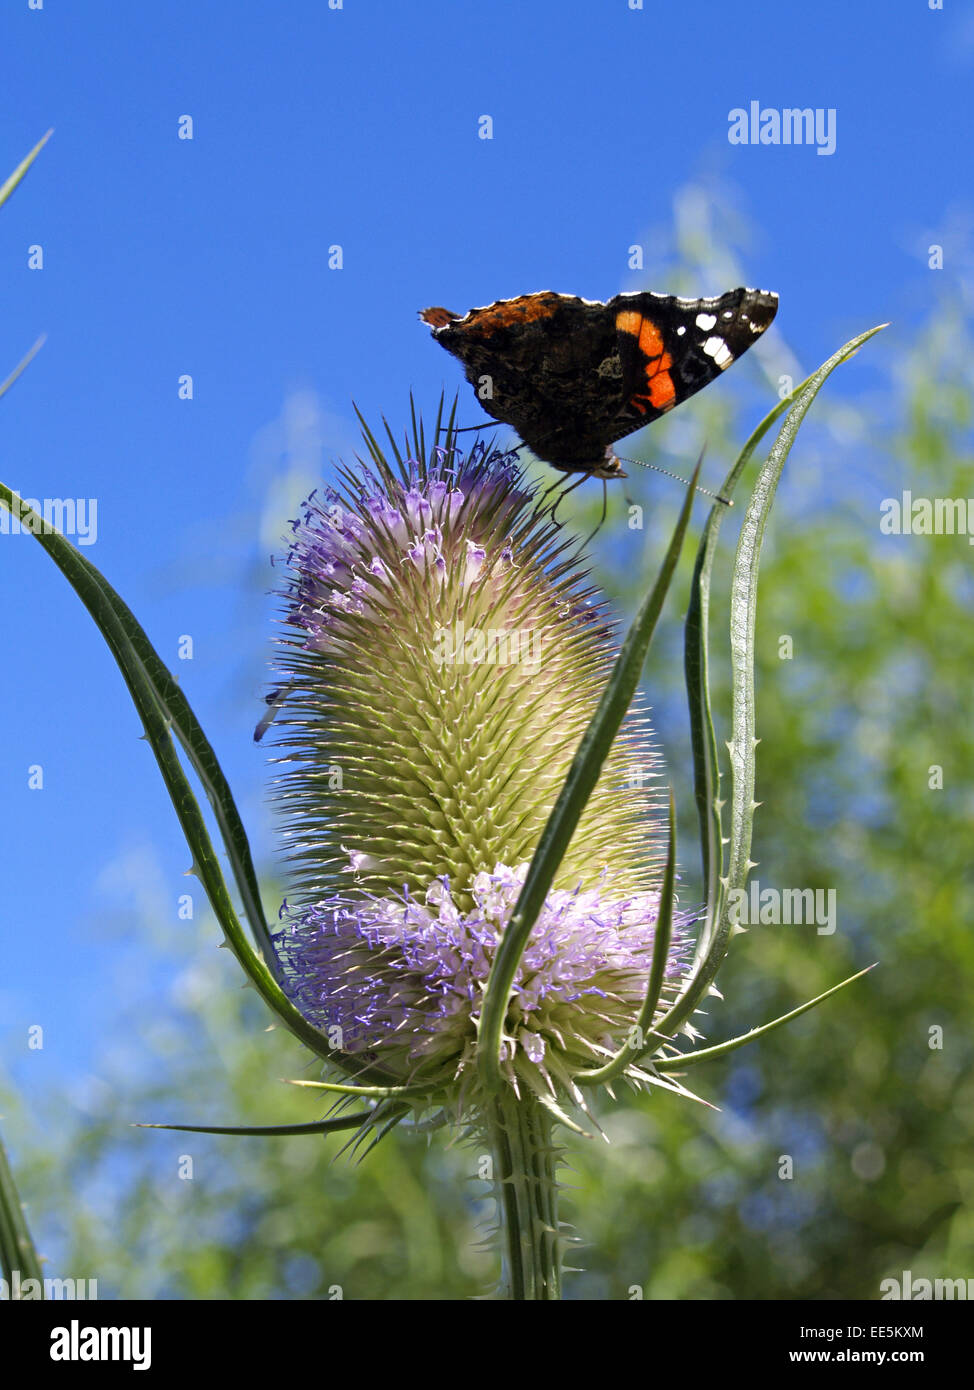 Aussenaufnahme, Distel, Distelfalter, Falter, Insekt, Insekten, Makro, Makros, Nahaufnahme, Nahaufnahmen, Natur, - Stock Image